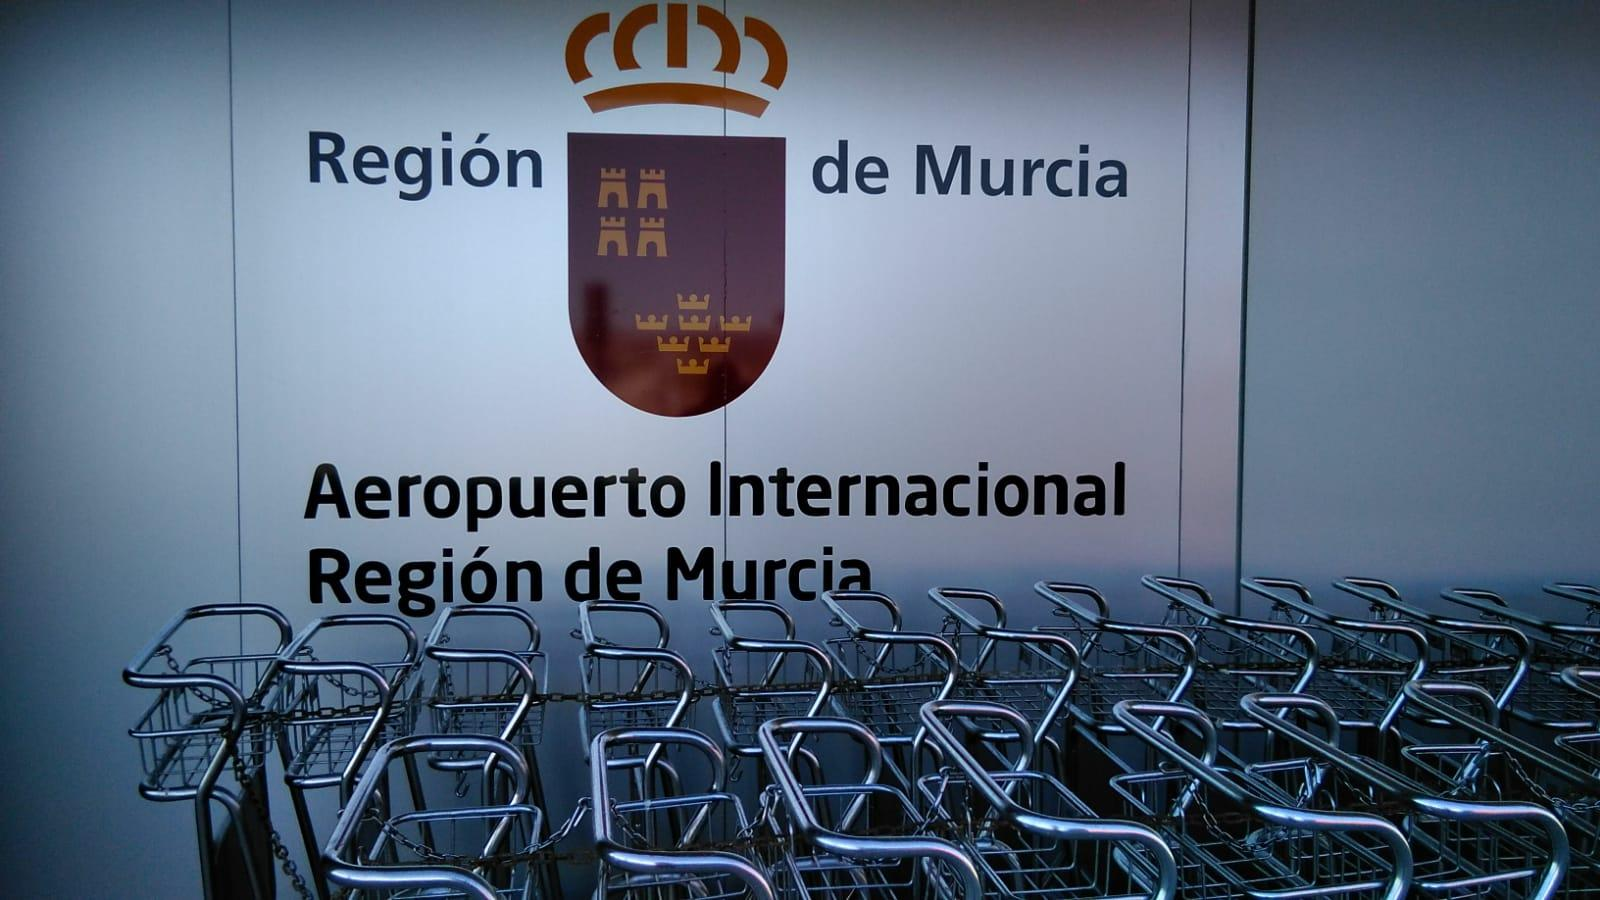 Aeropuerto De Corvera Murcia Mazza Comunicacion